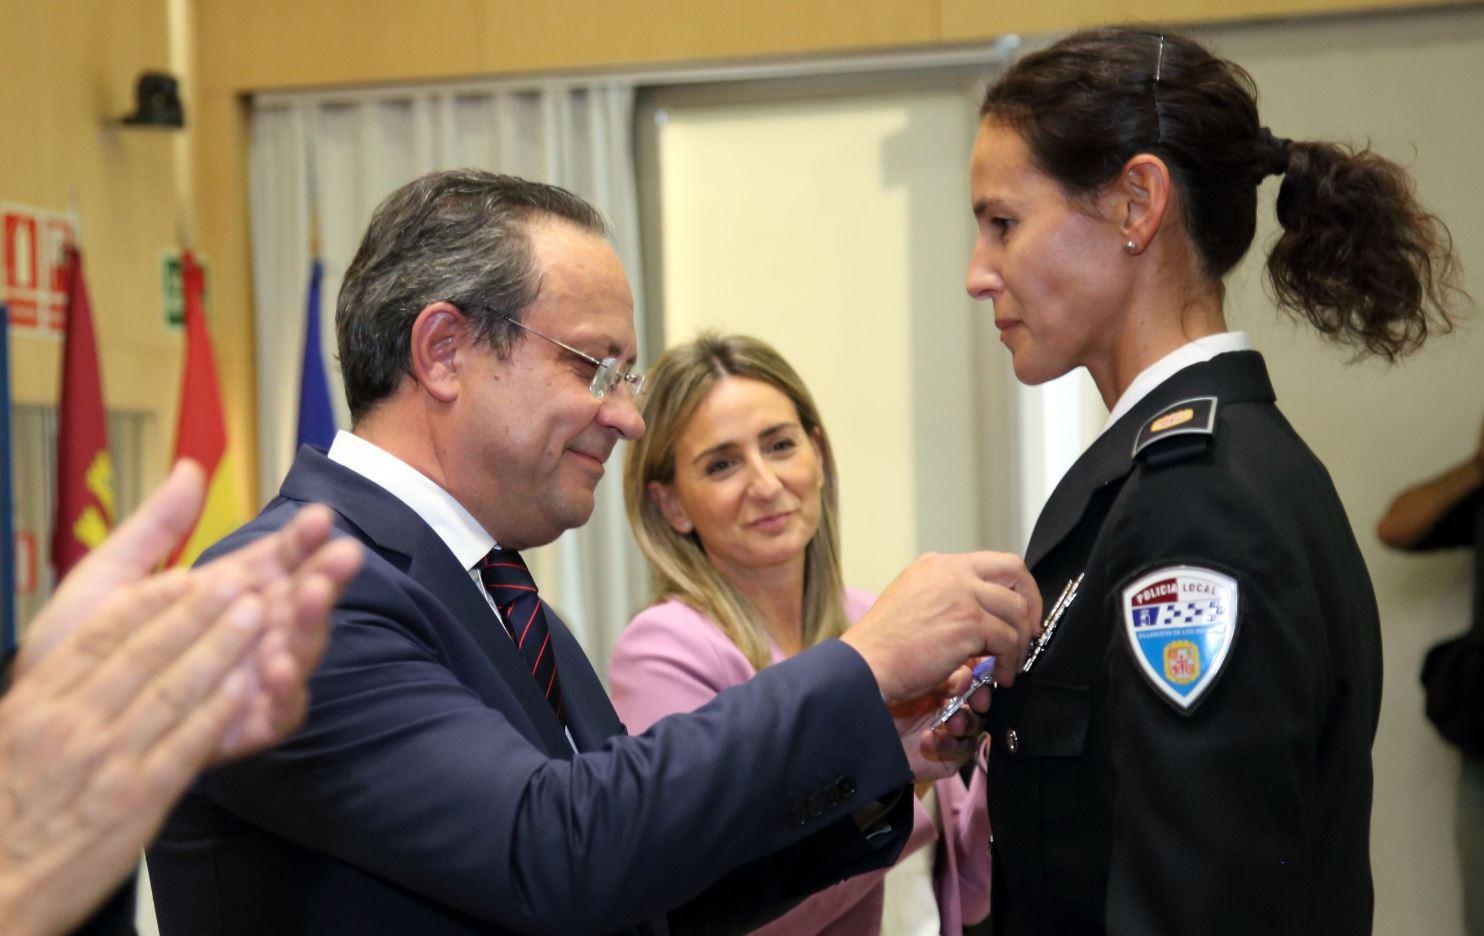 Mercedes Lillo Mata recibe la Medalla de Plata al Mérito Profesional